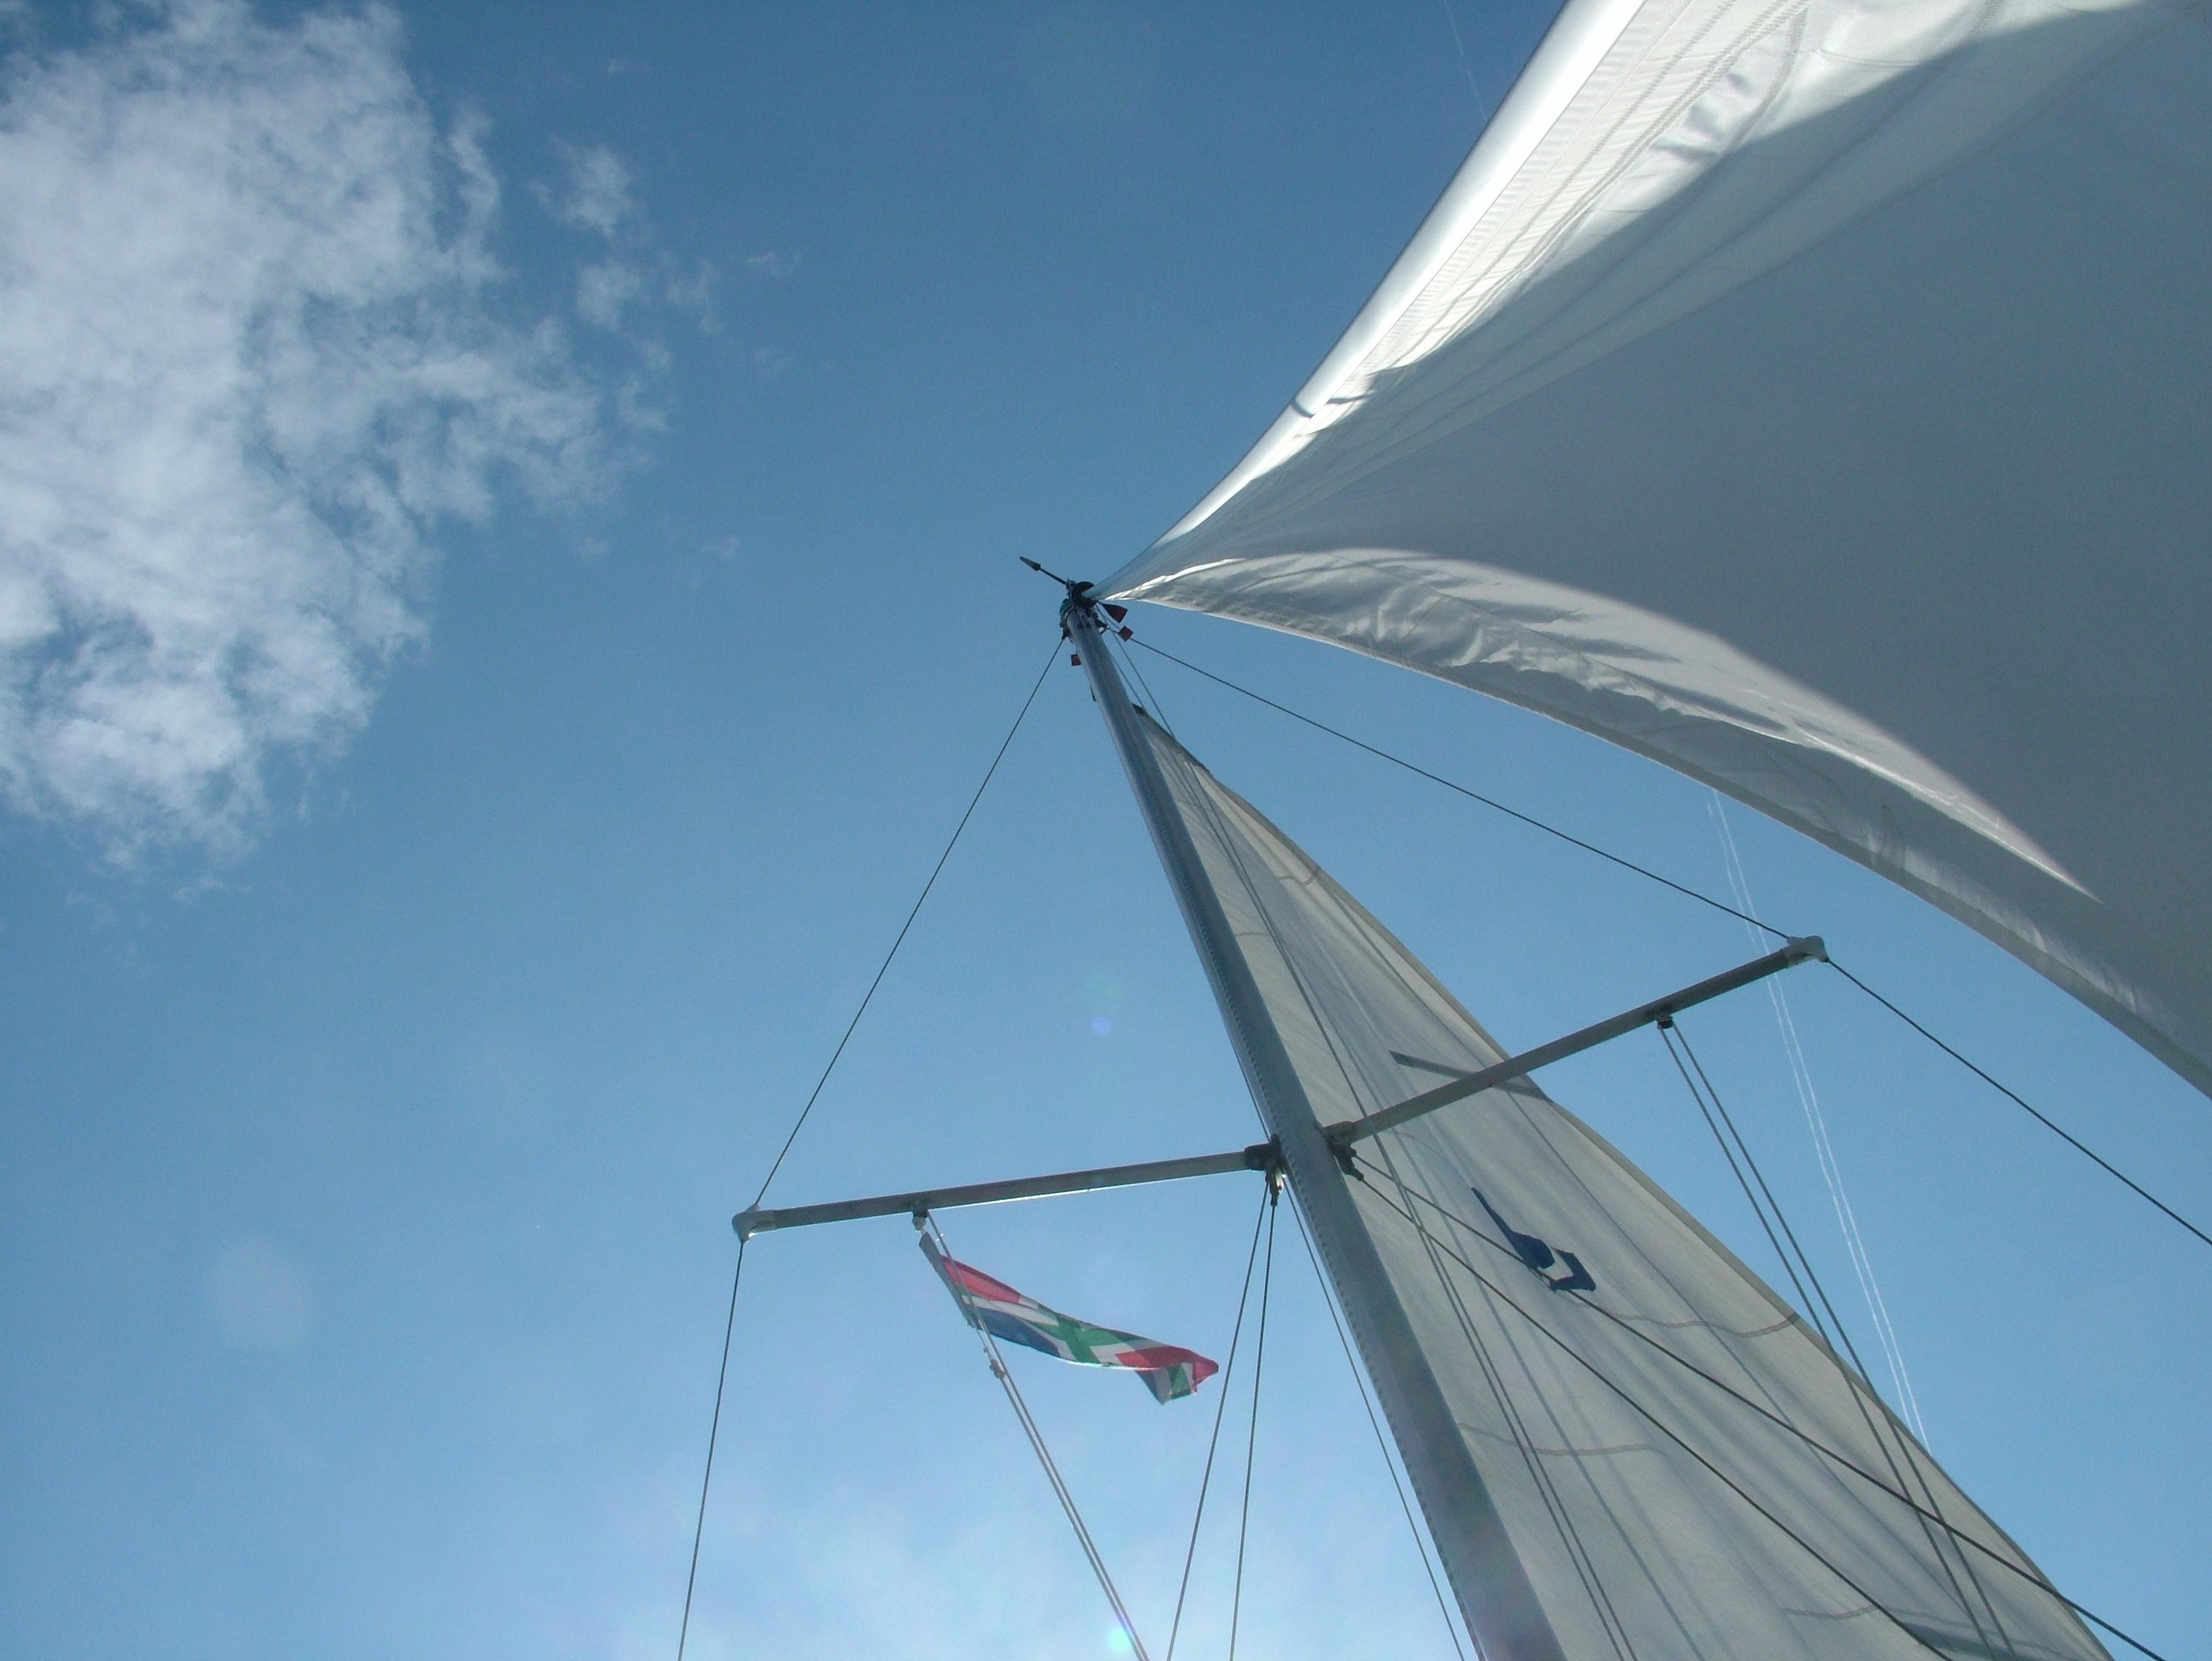 Mast sailing wikipedia mast sailing sciox Gallery